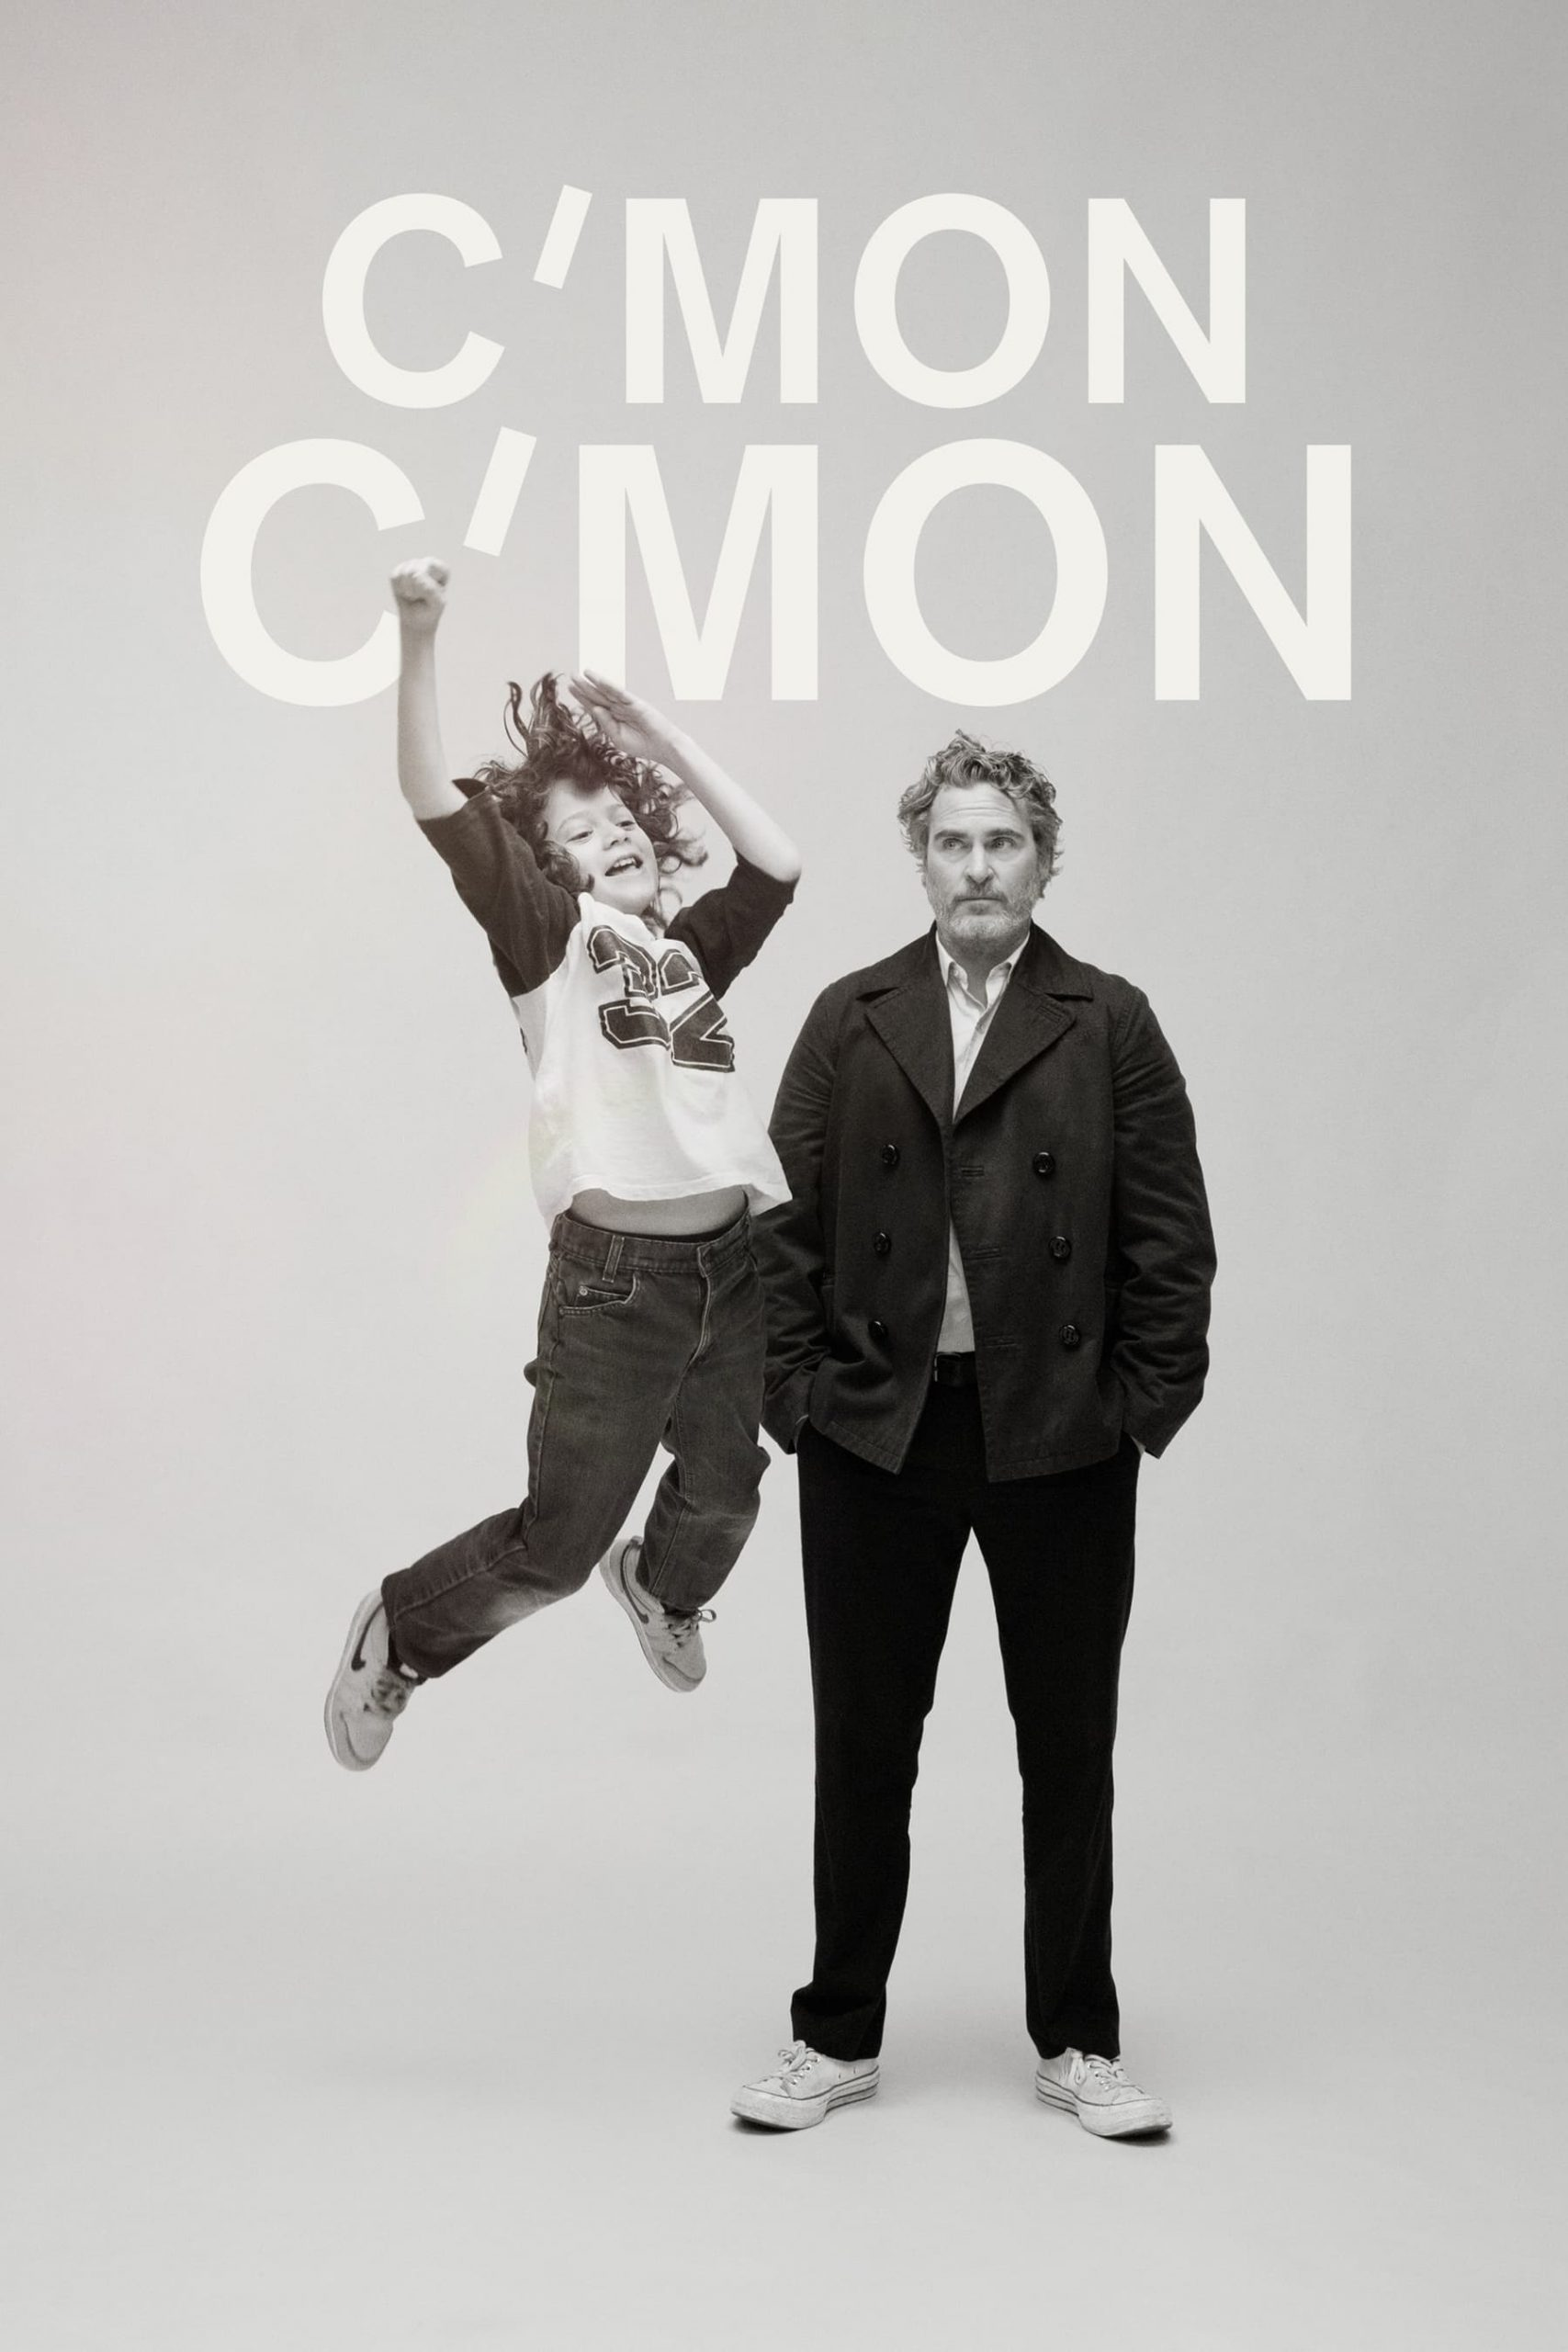 Poster for C'mon C'mon